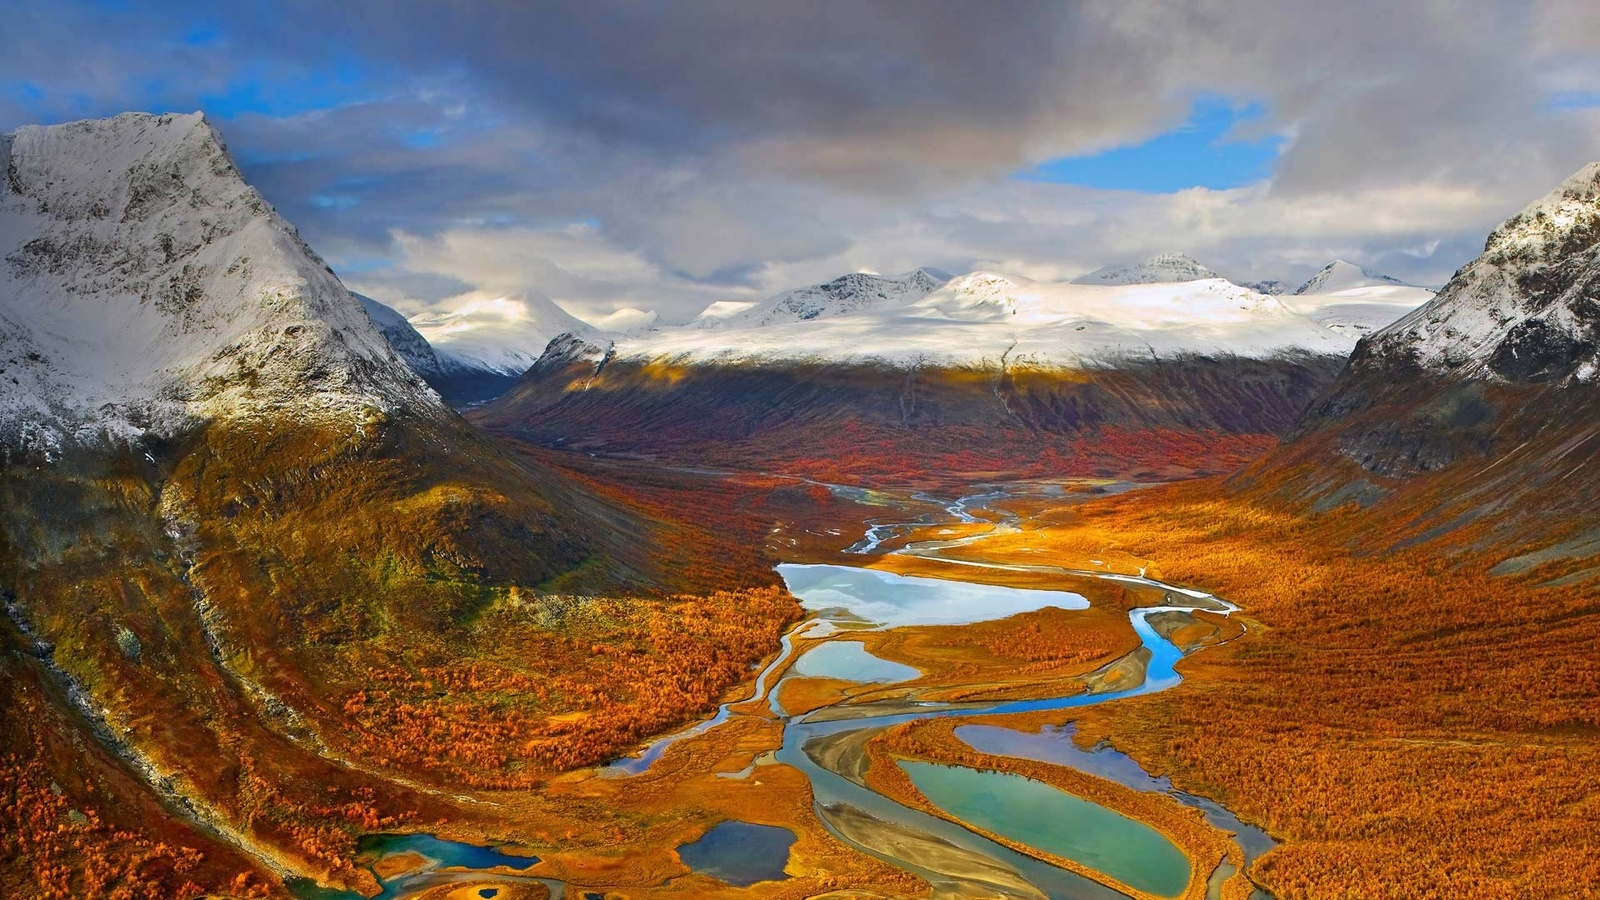 небо, облака, горы, вершины, снег, долина, река